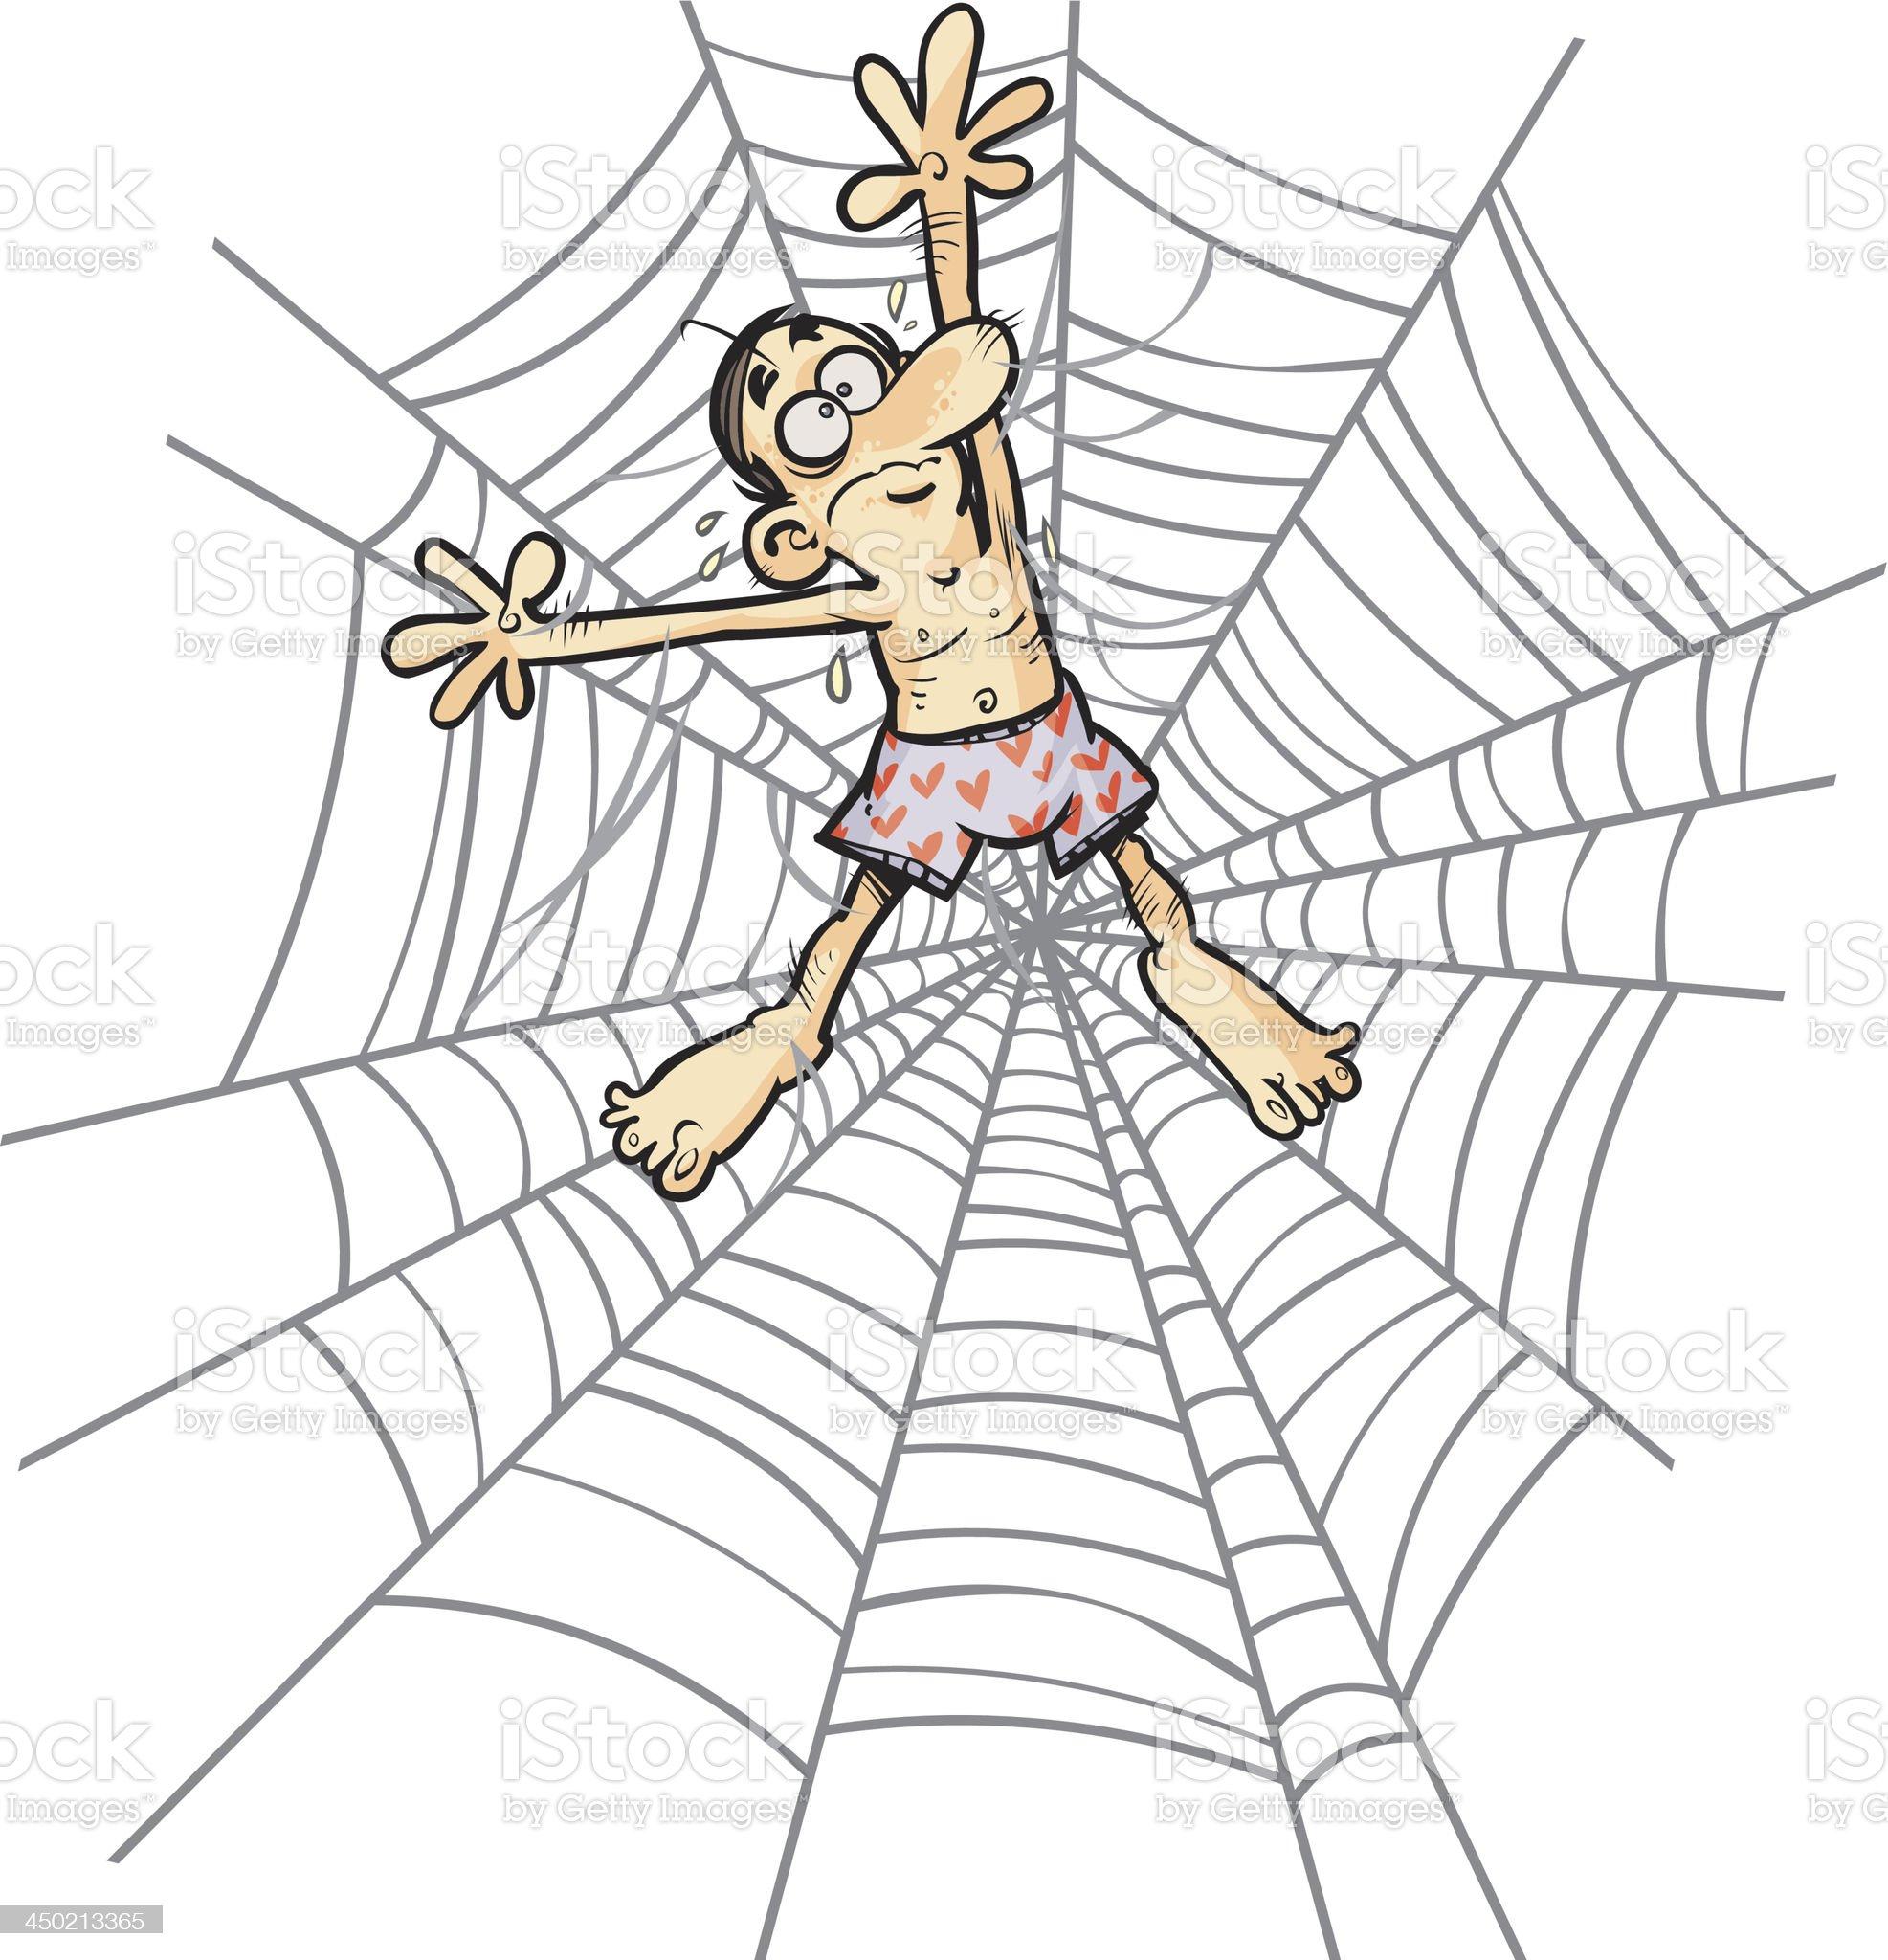 Cartoon Man in Spider web. royalty-free stock vector art